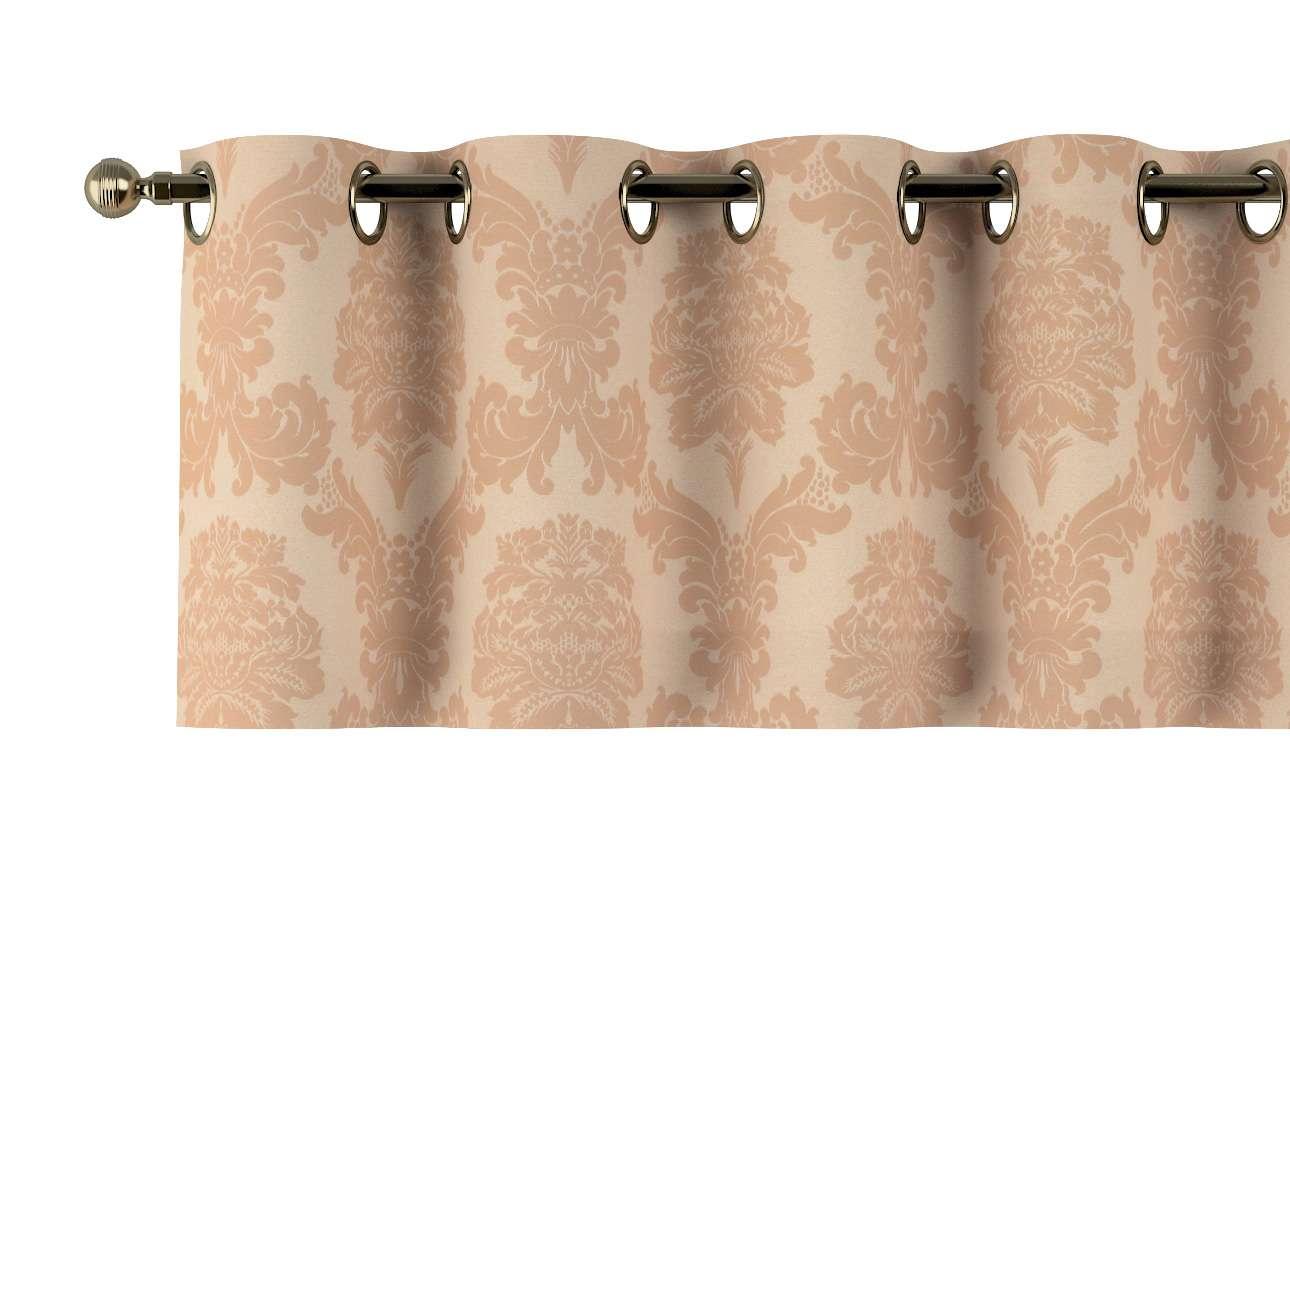 Lambrekin na kółkach 130x40cm w kolekcji Damasco, tkanina: 613-04